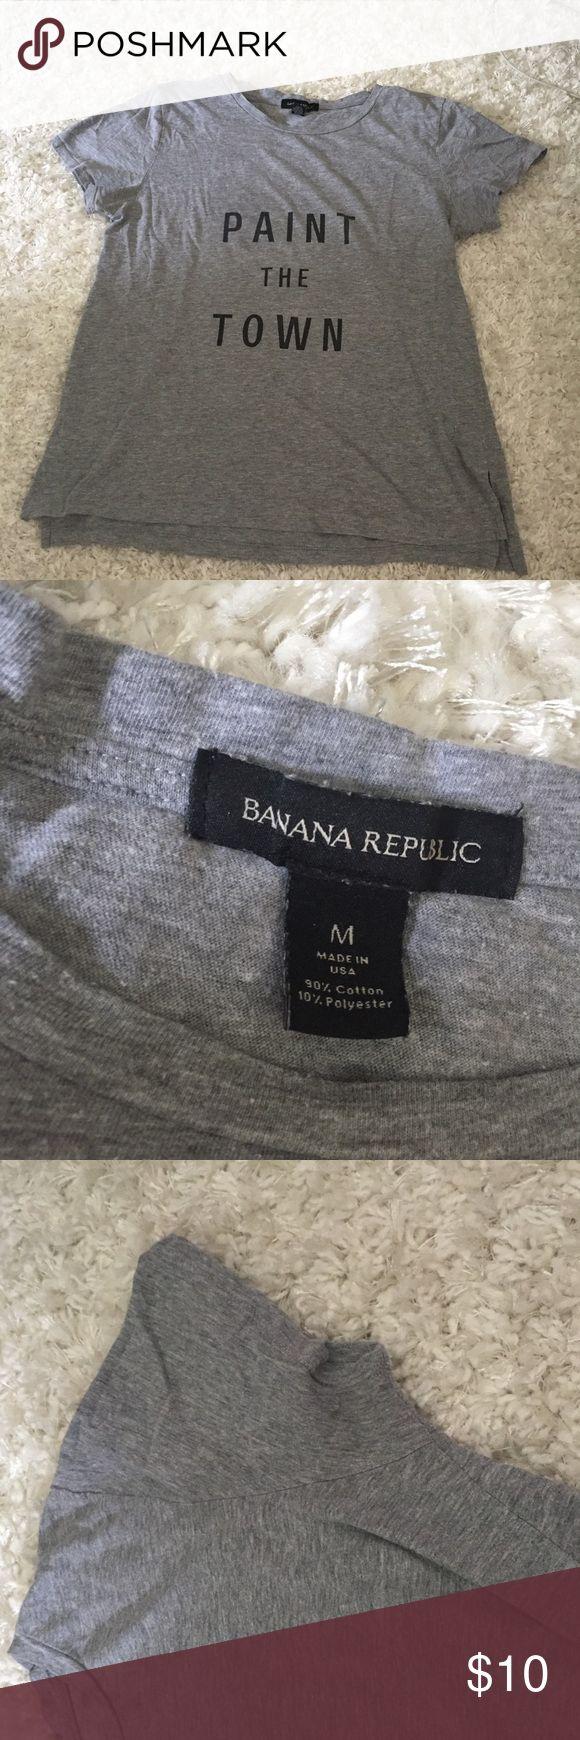 "Banana Republic tee Banana republic "" paint the town"" tshirt. Great condition Banana Republic Tops Tees - Short Sleeve"